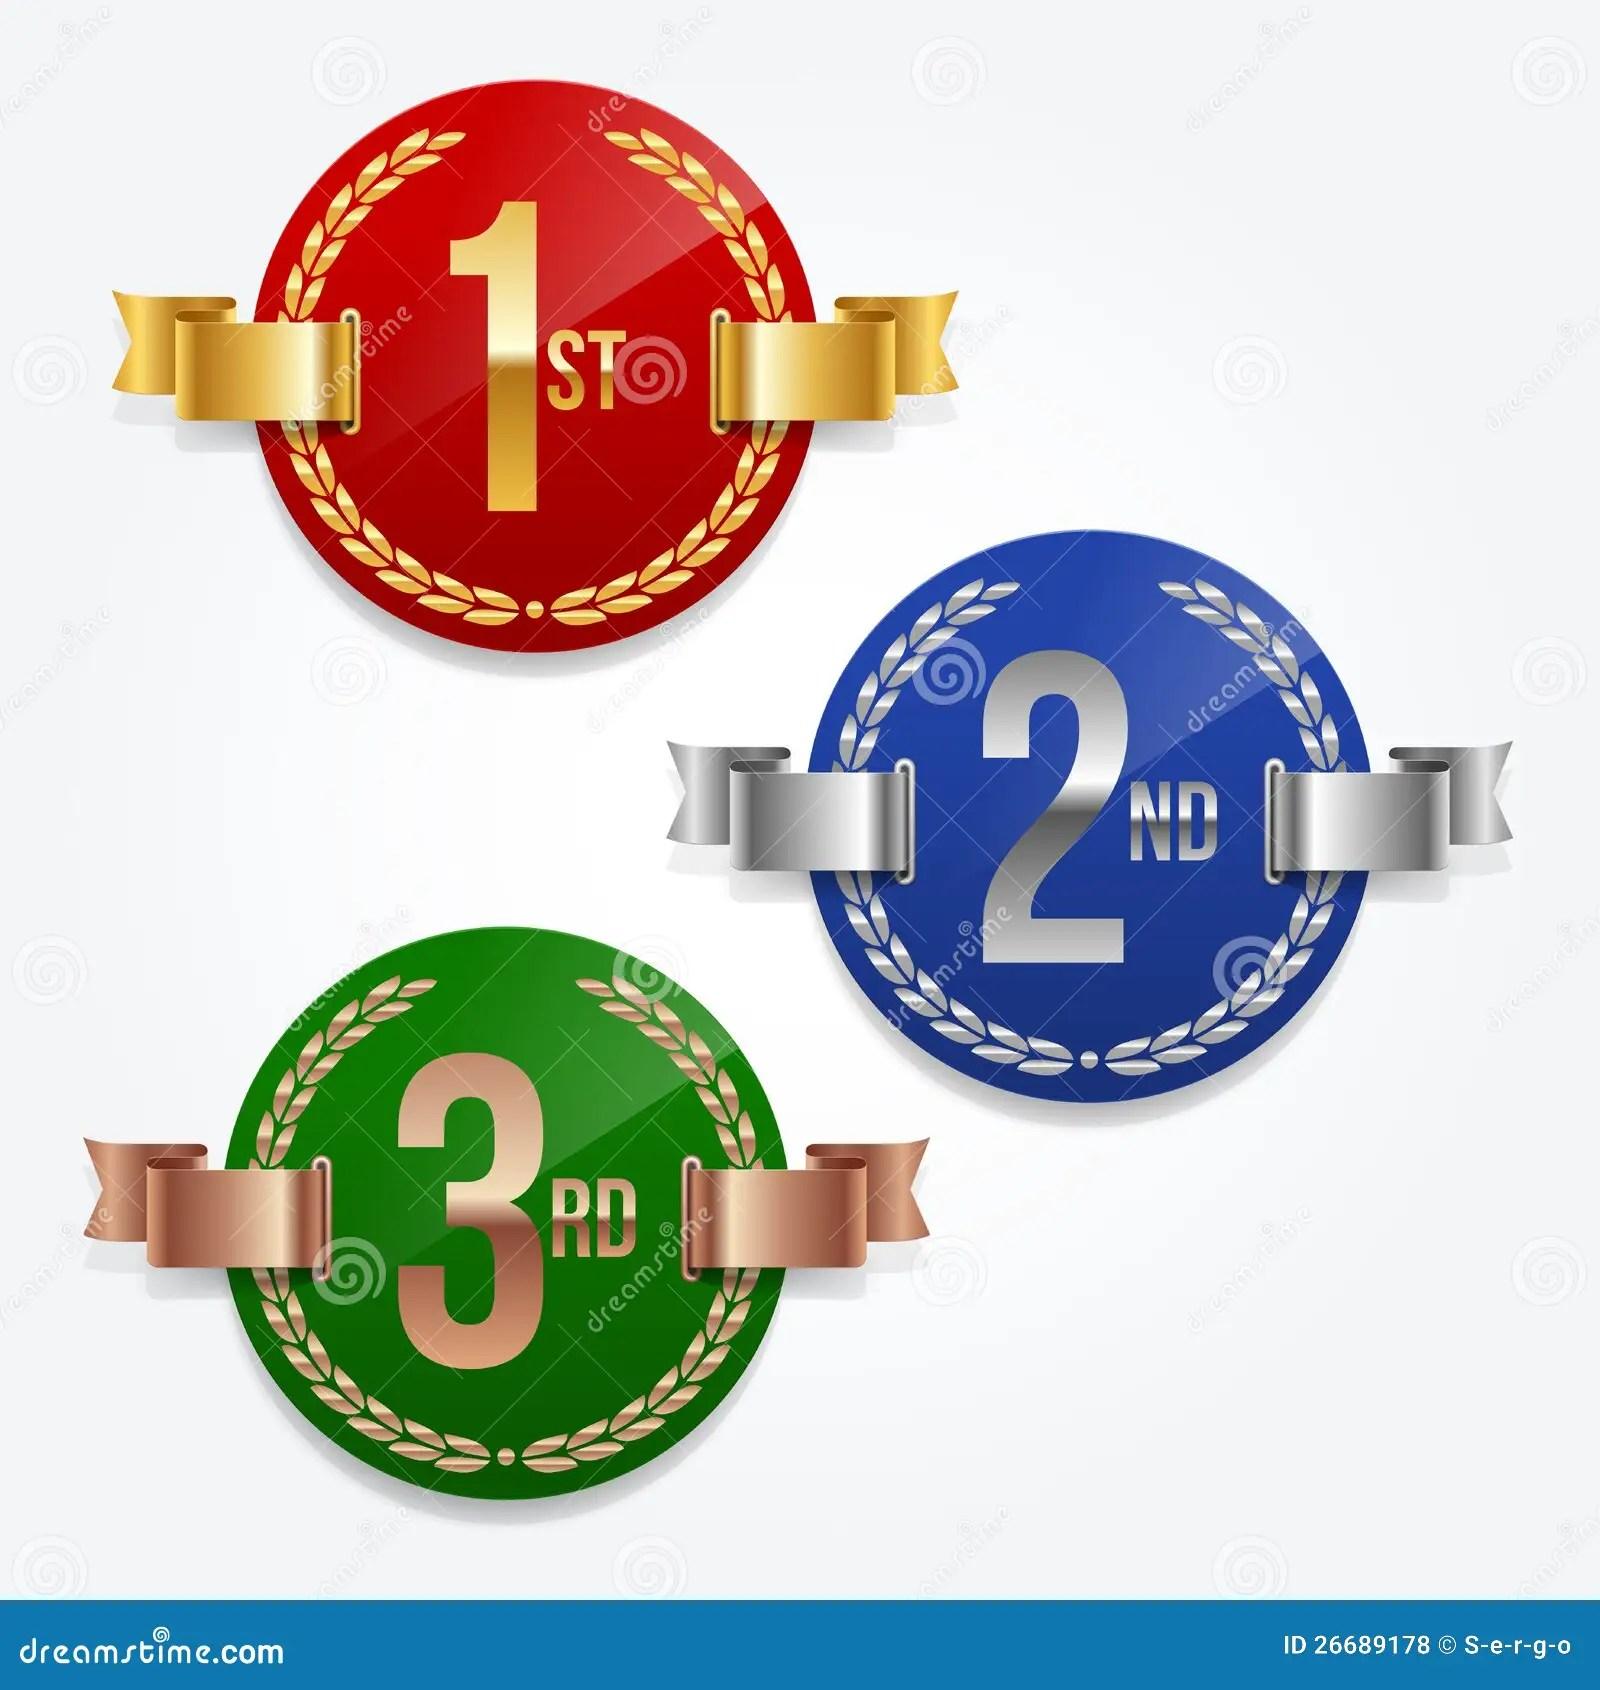 1st 2nd 3rd Awards Emblems Royalty Free Stock Photos